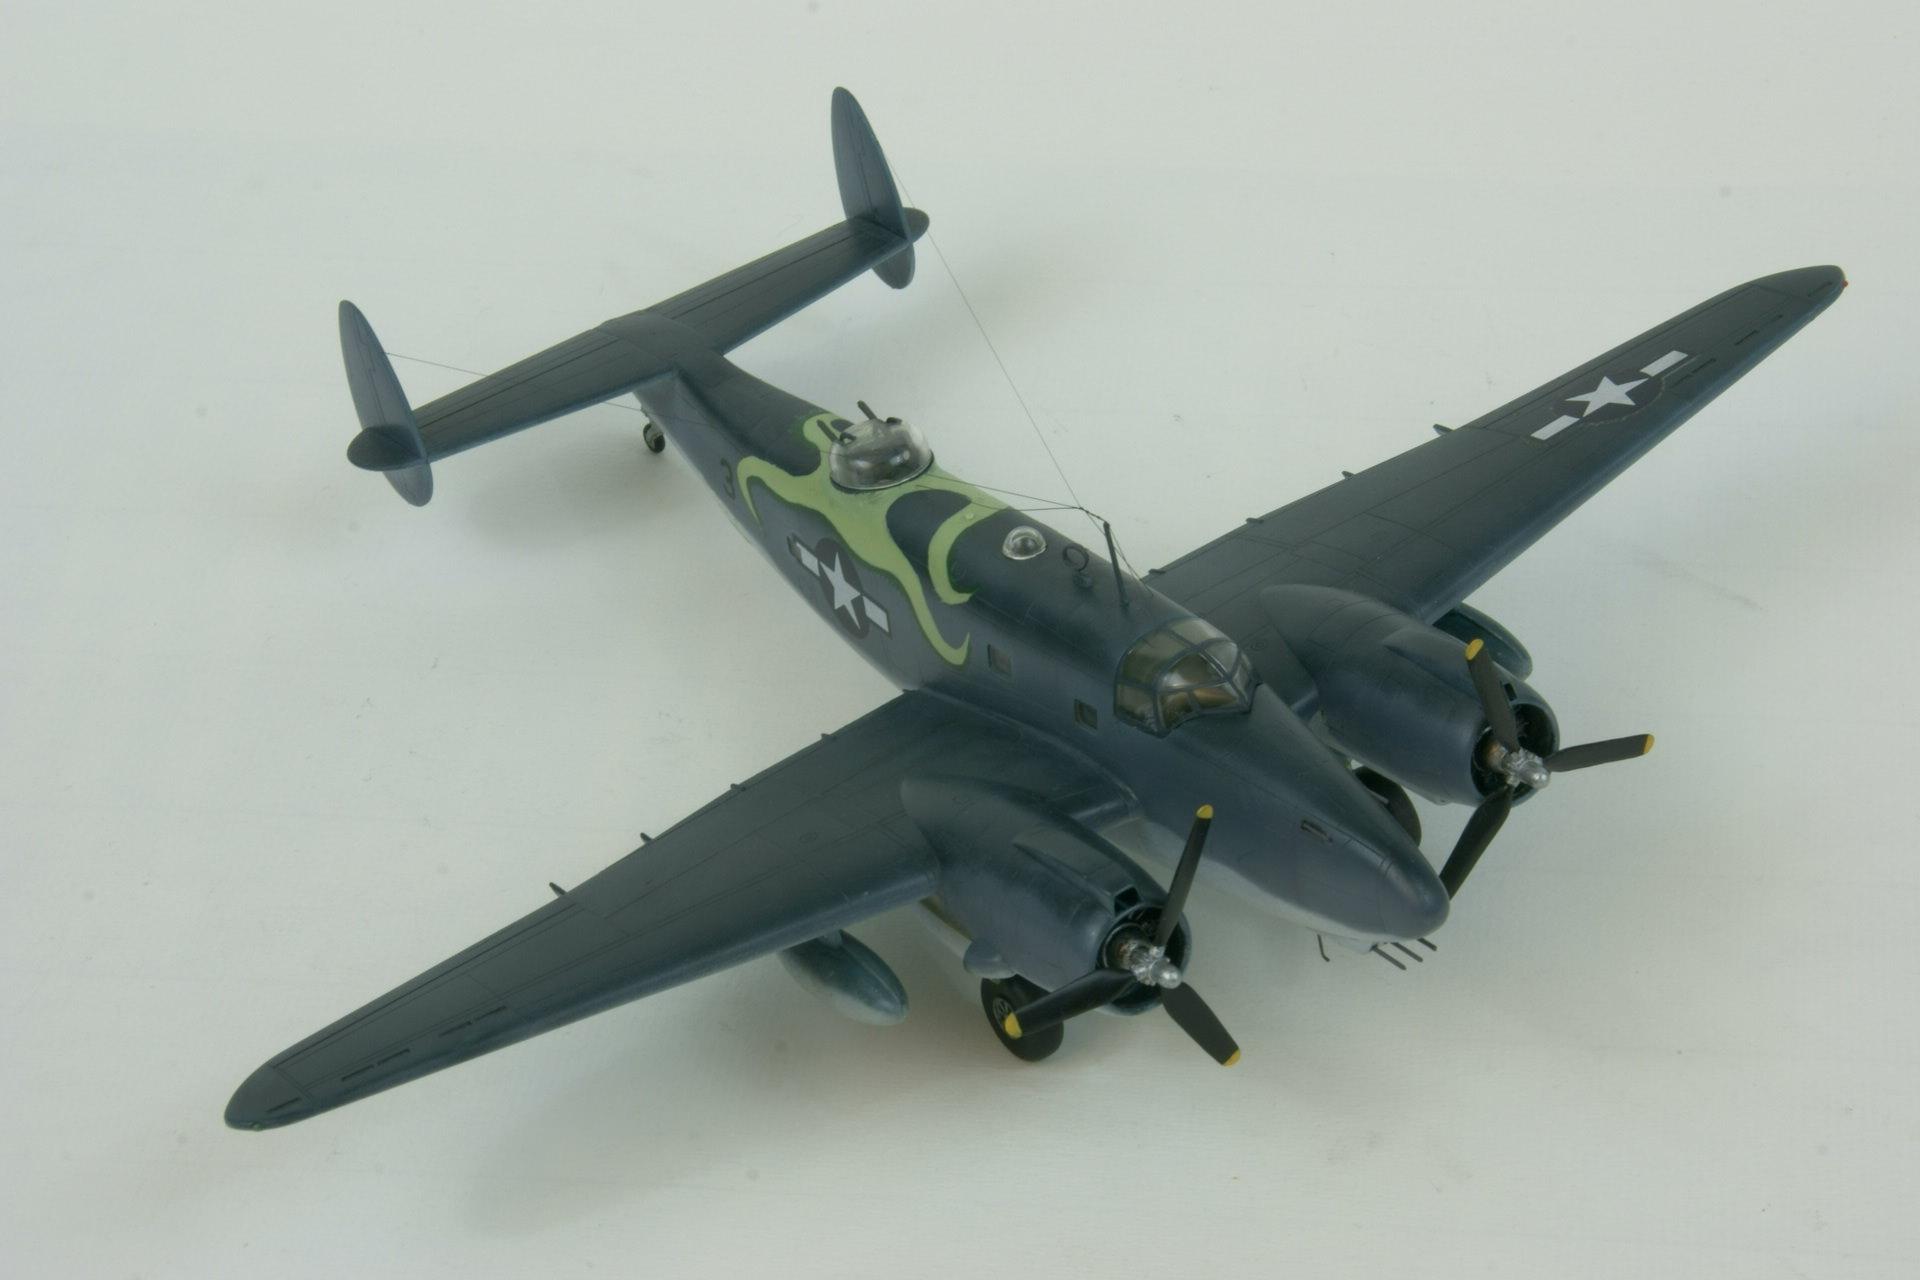 Lockheed pv 1 ventura 9 2